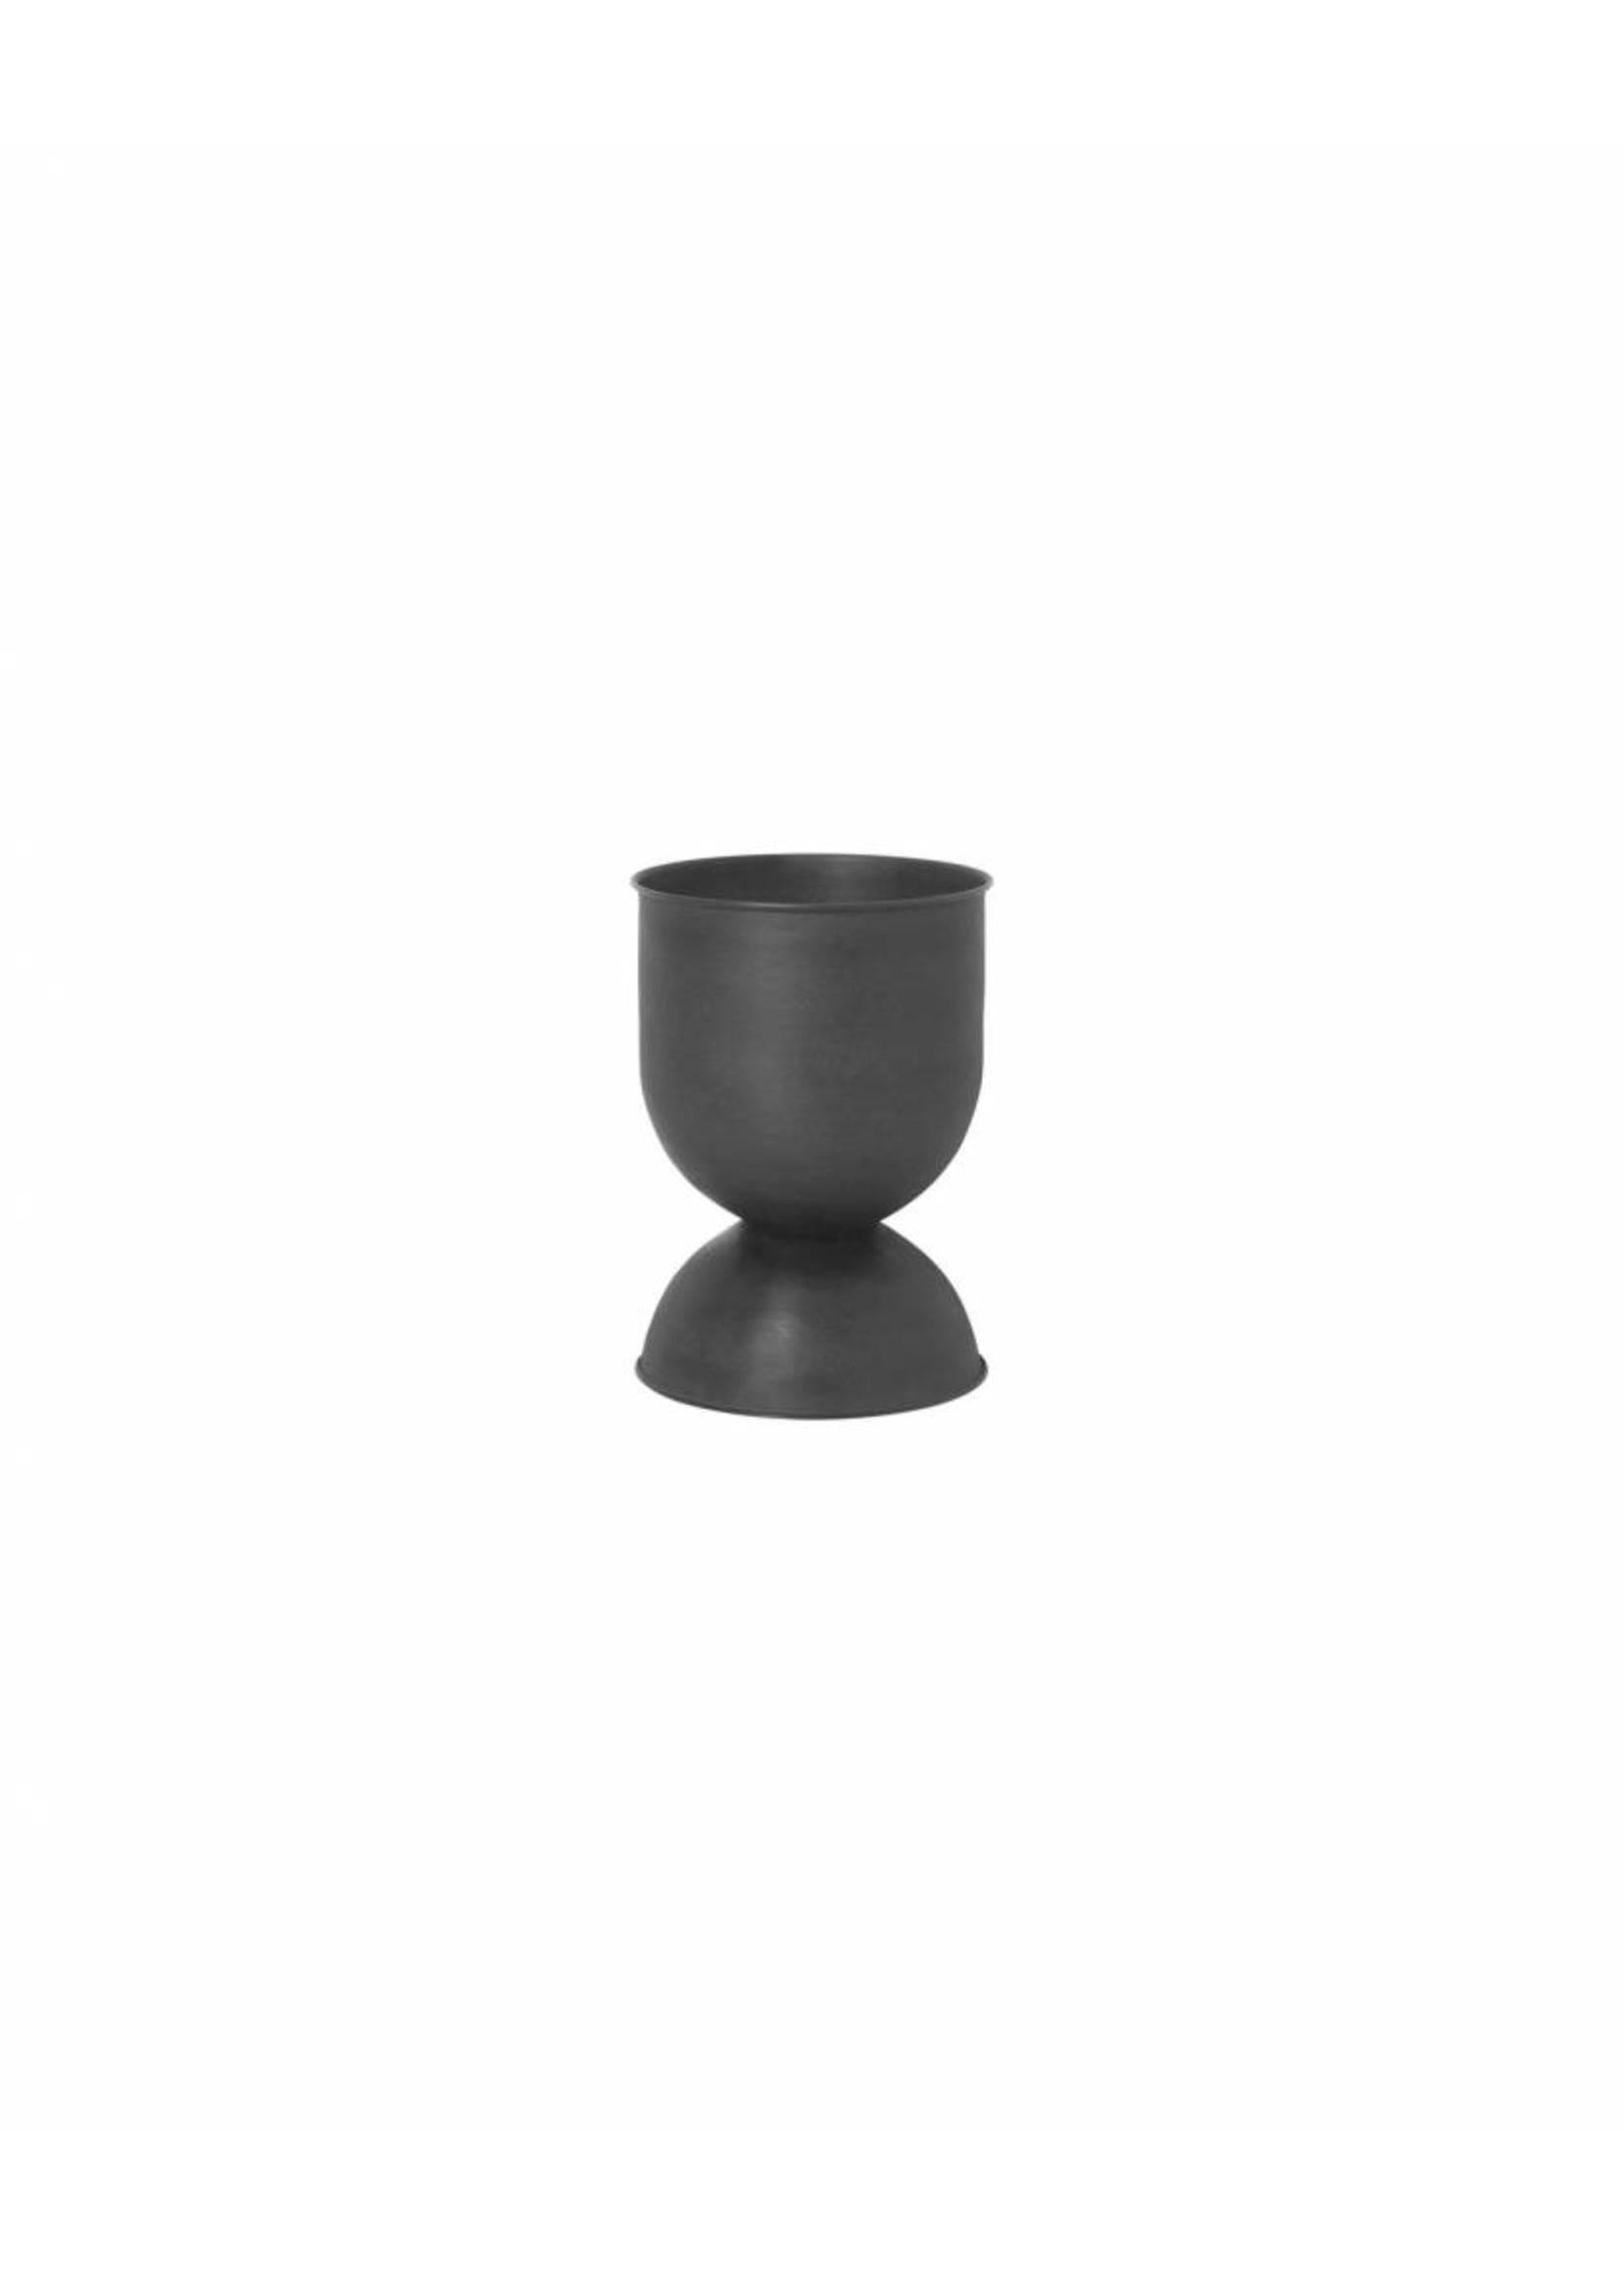 ferm LIVING ferm LIVING Hourglass Plant Pot - Small